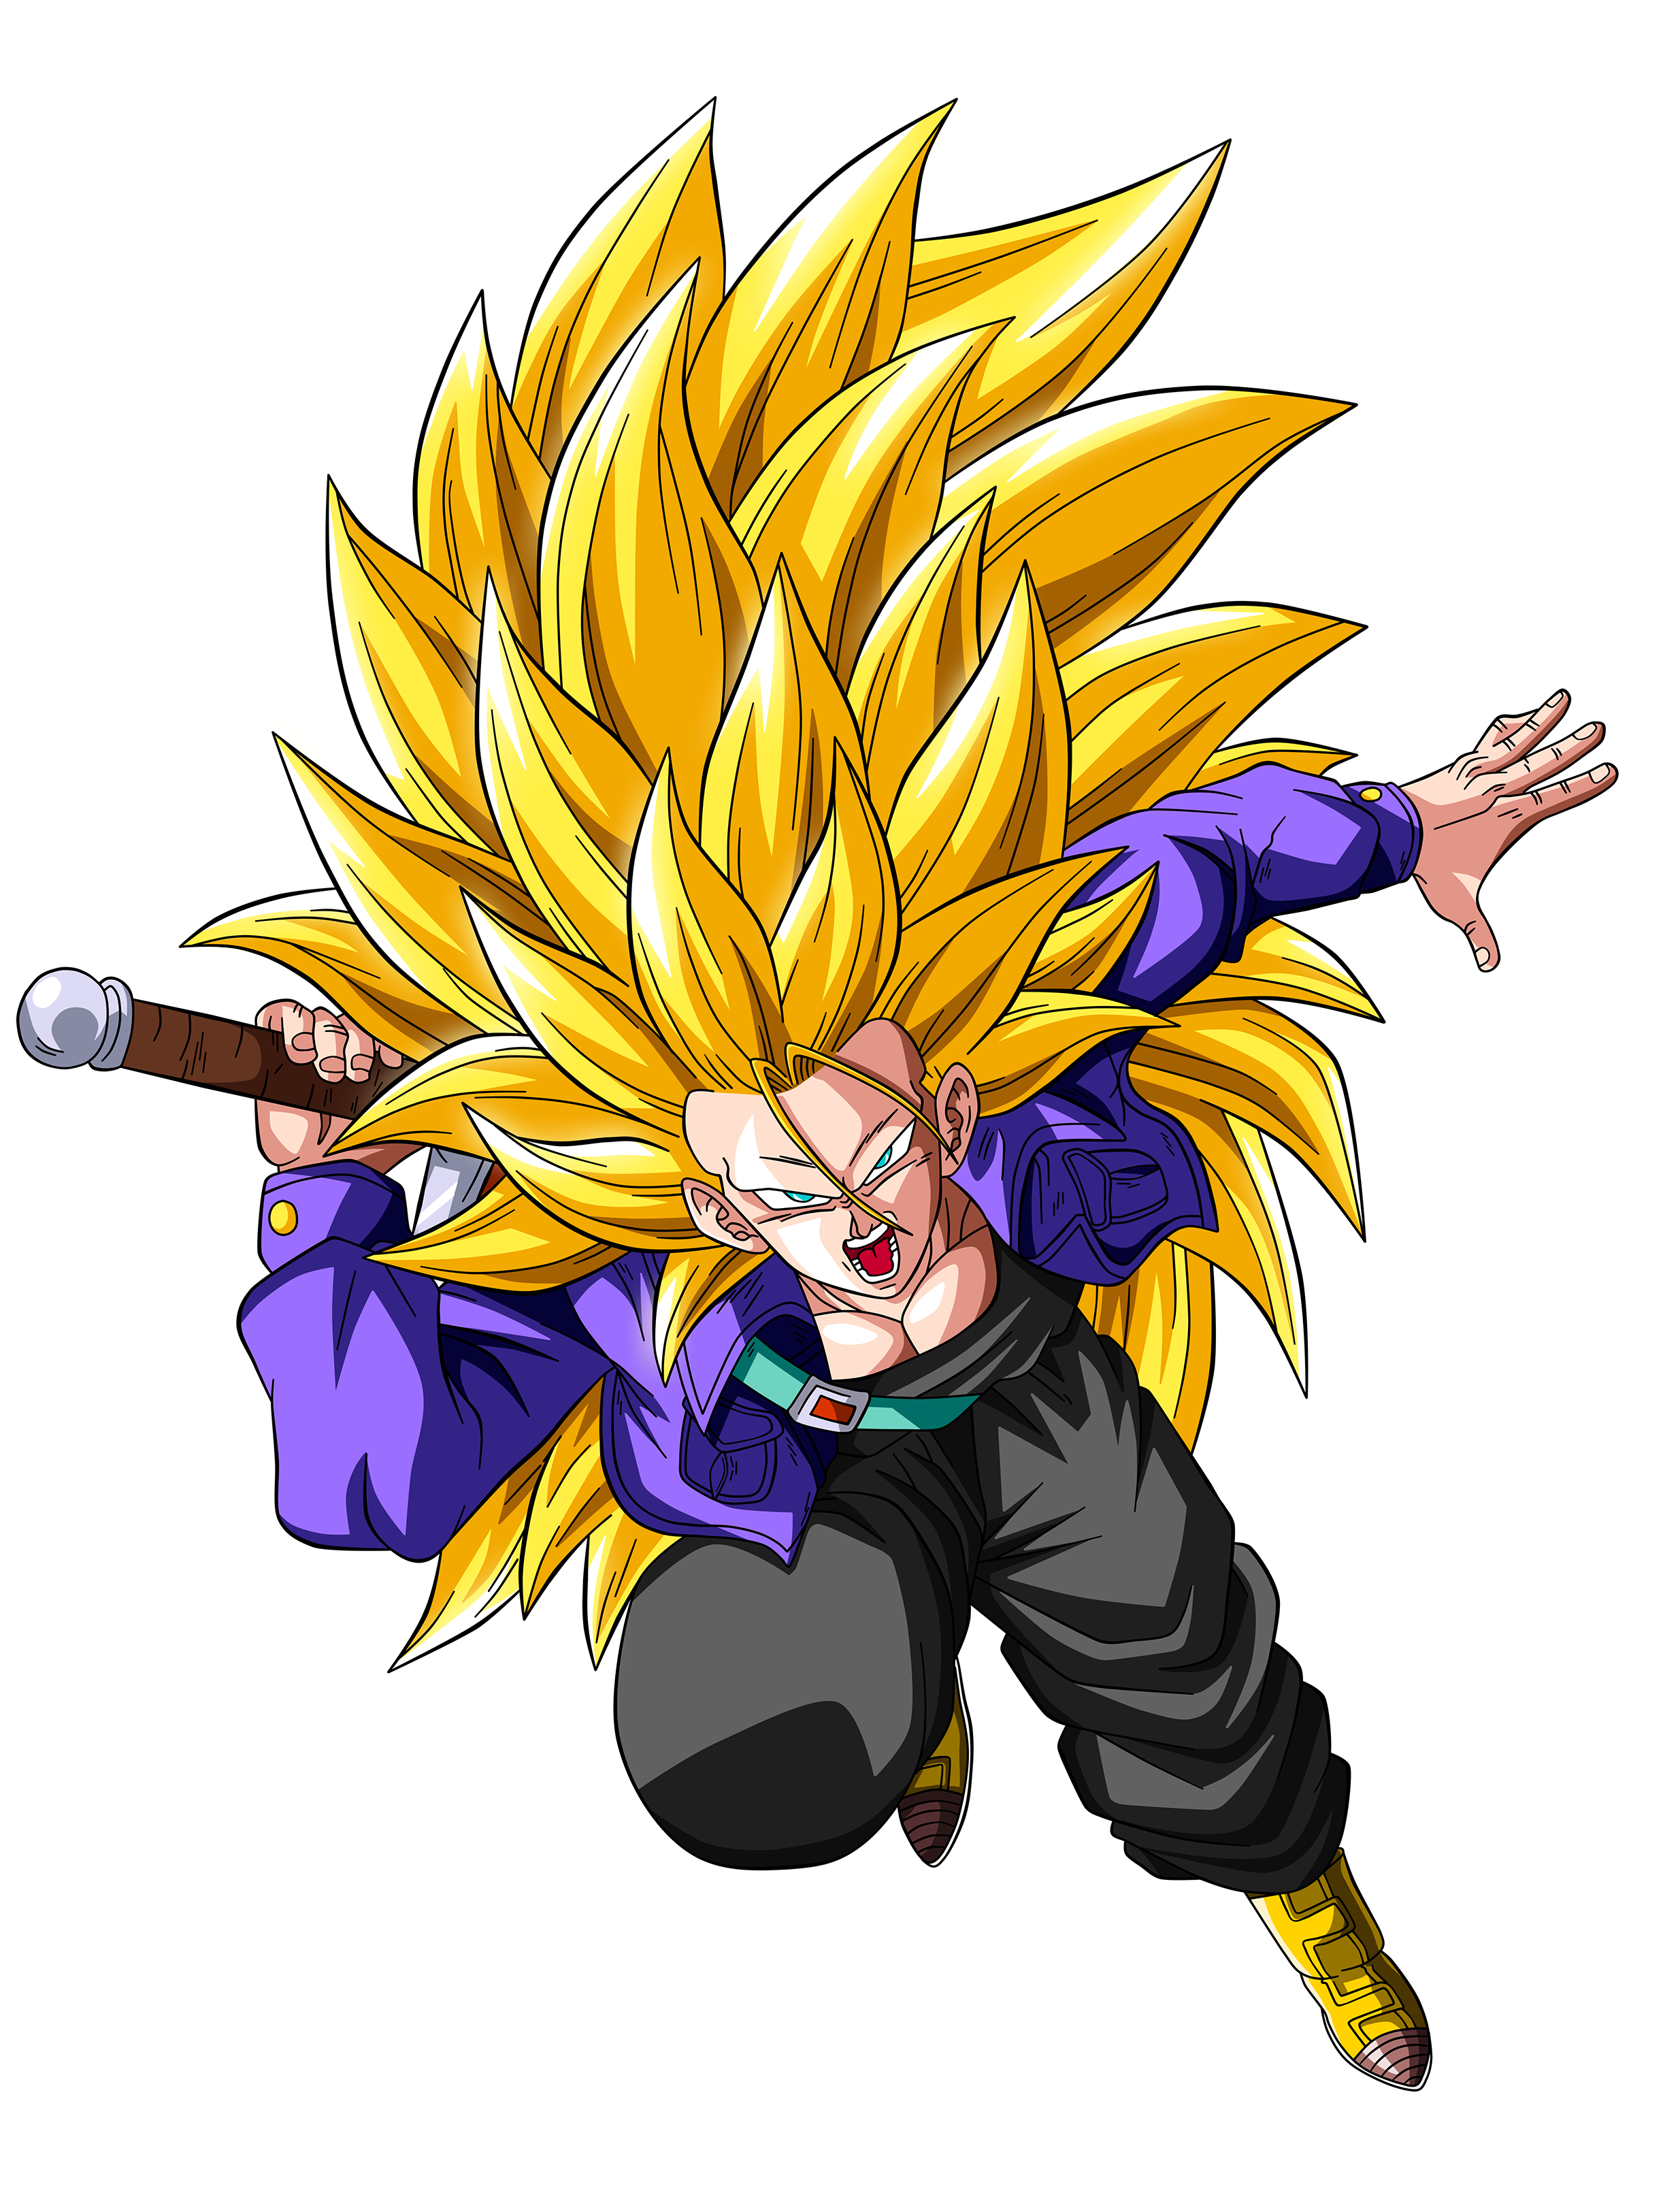 Trunks Super Saiyan 3 By Originalsupersaiyan On Deviantart Dragon Ball Super Wallpapers Dragon Ball Super Manga Dragon Ball Art